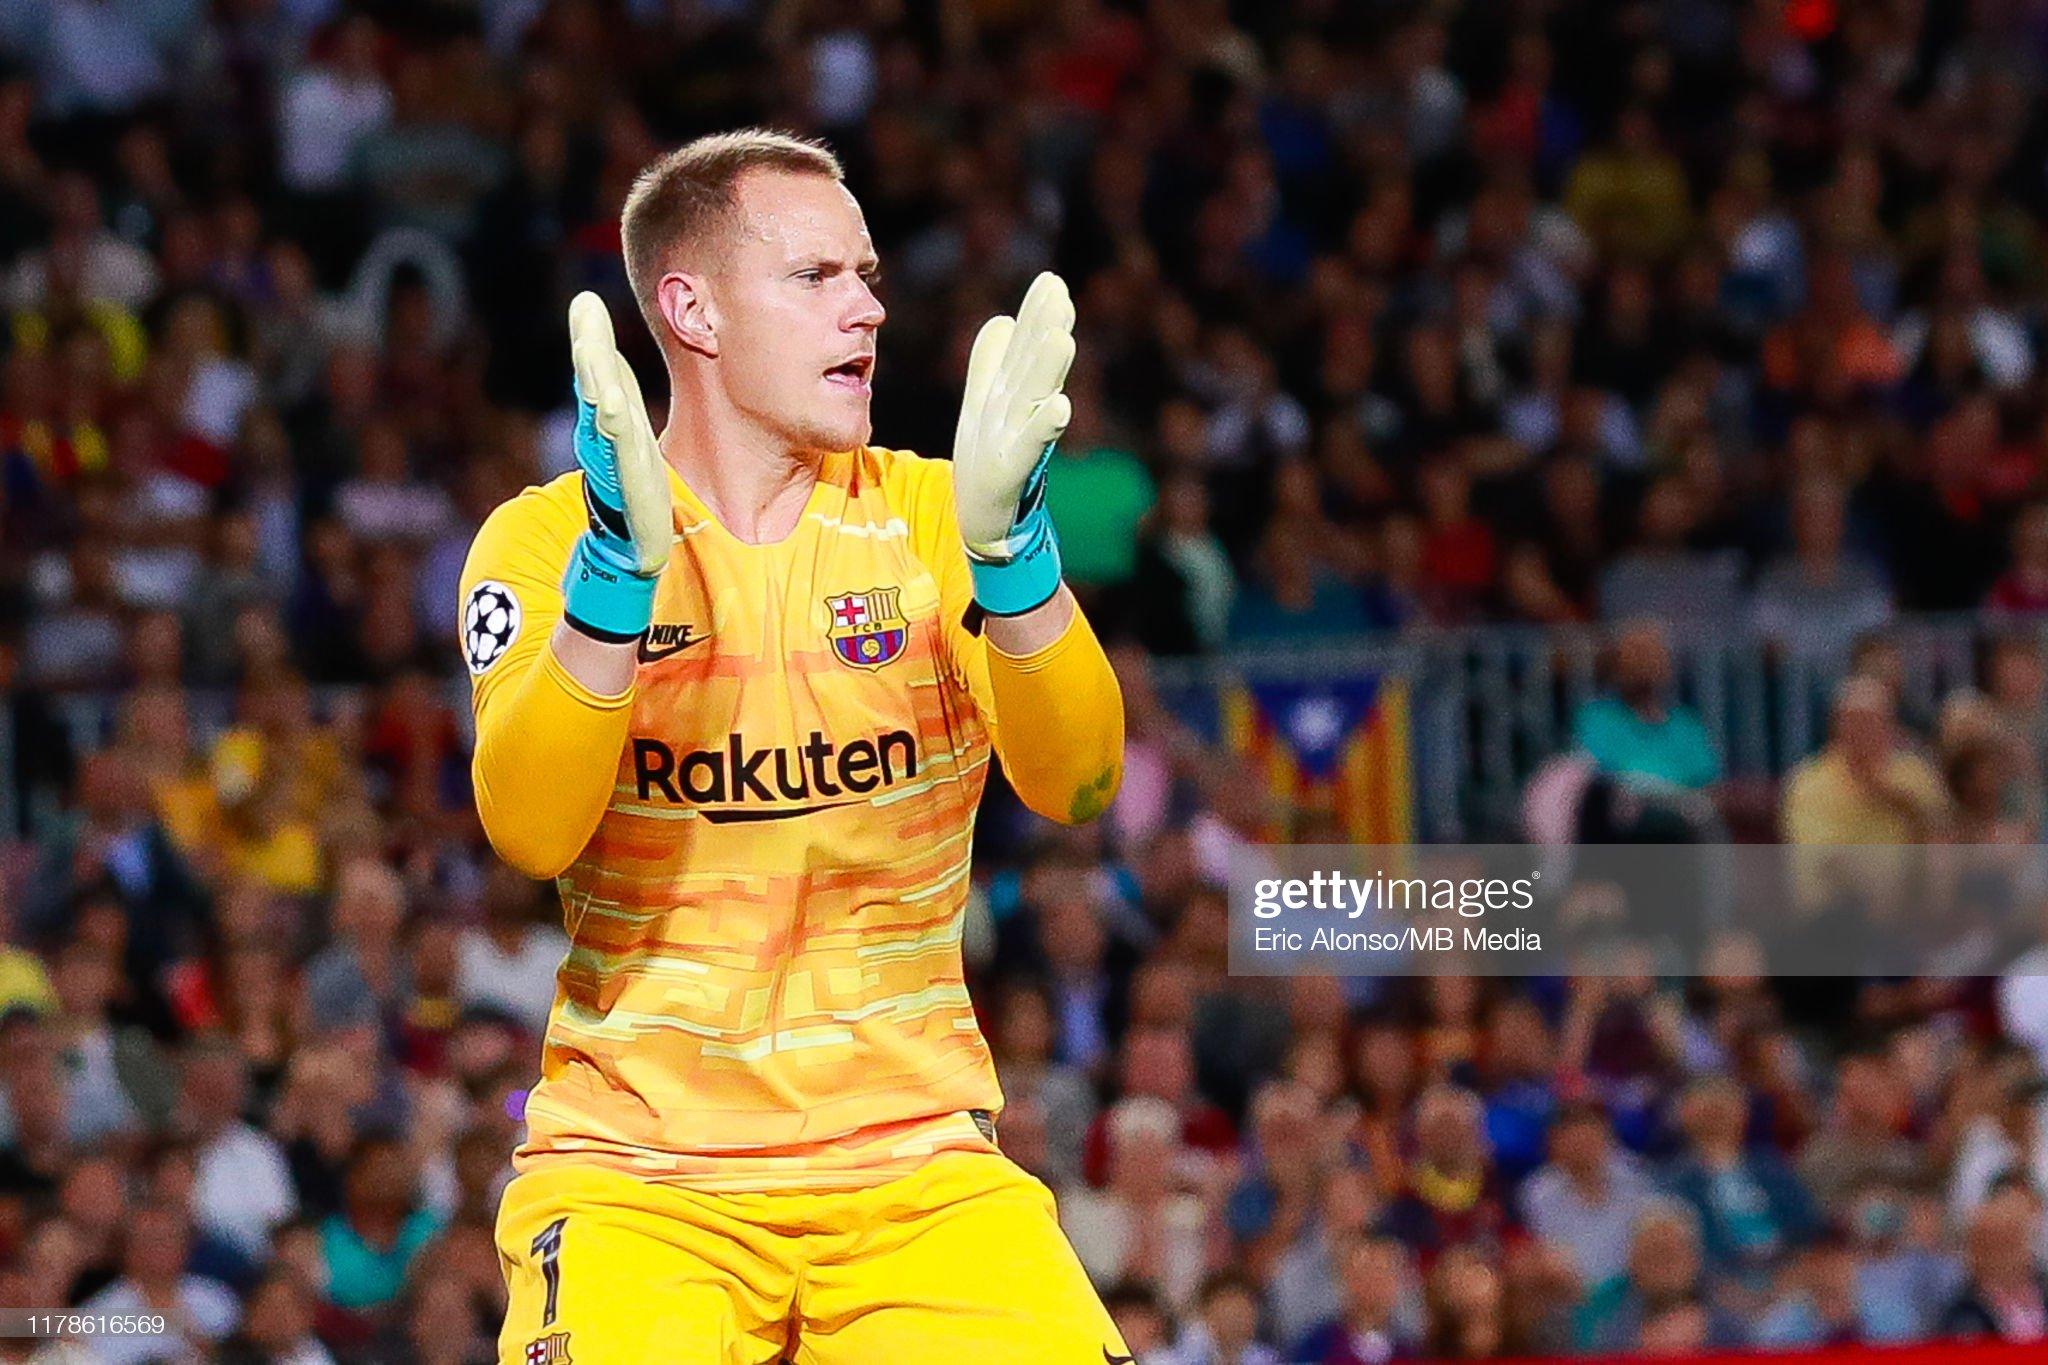 صور مباراة : برشلونة - إنتر 2-1 ( 02-10-2019 )  Marc-andre-ter-stegen-of-fc-barcelona-reacts-during-the-uefa-league-picture-id1178616569?s=2048x2048